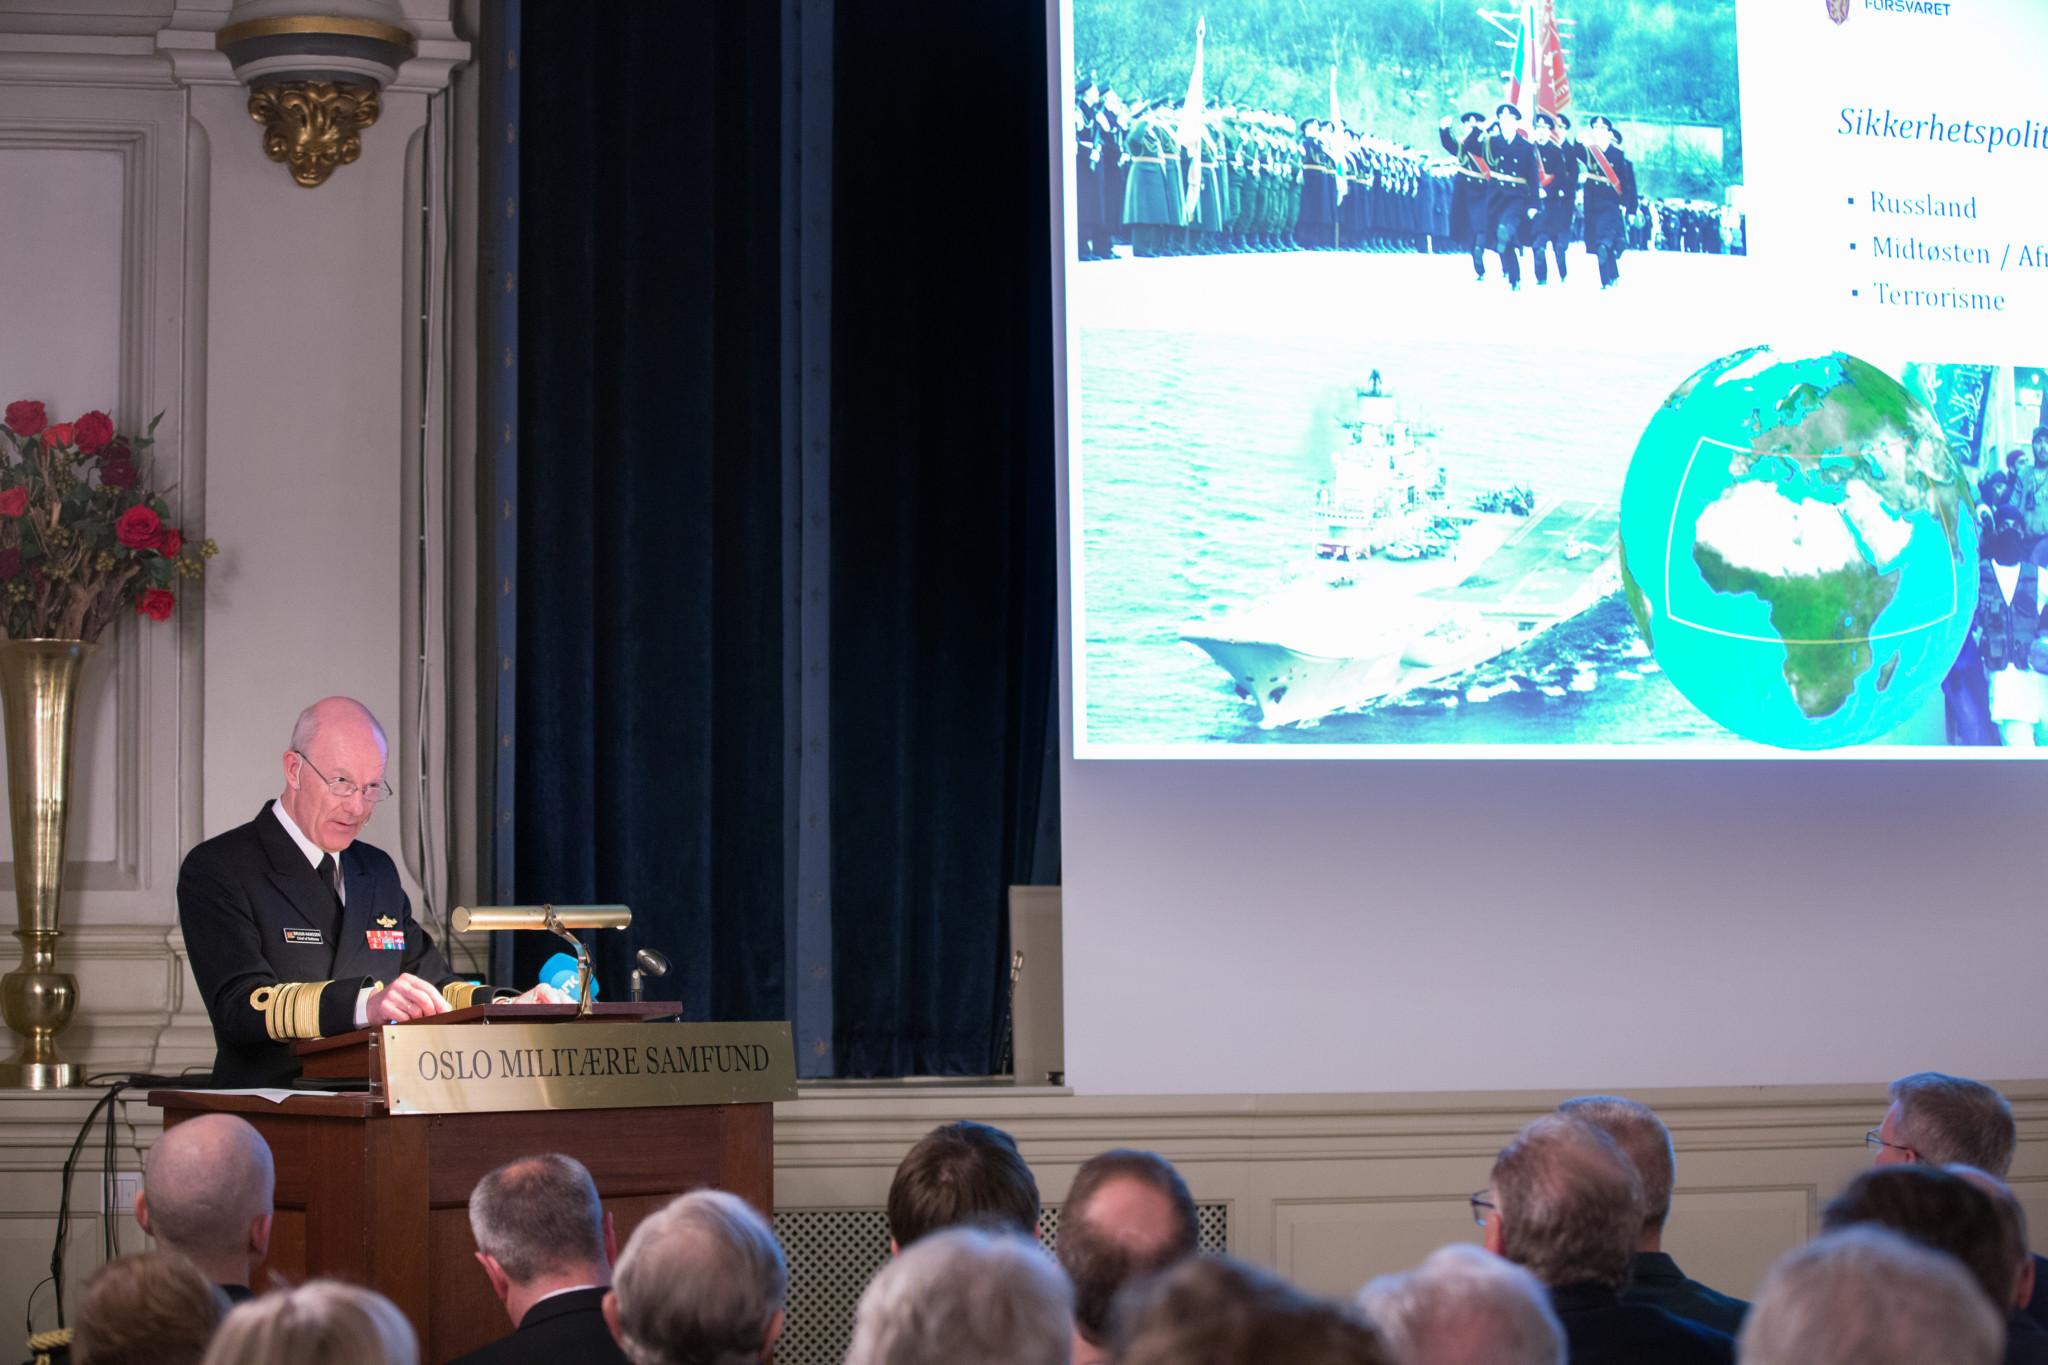 Forsvarssjef Haakon Bruun-Hanssen holdt sitt årlige foredrag i Oslo Militære Samfund (OMS) 30. januar 2017. Foto: FREDRIK NAUMANN/FELIX FEATURES